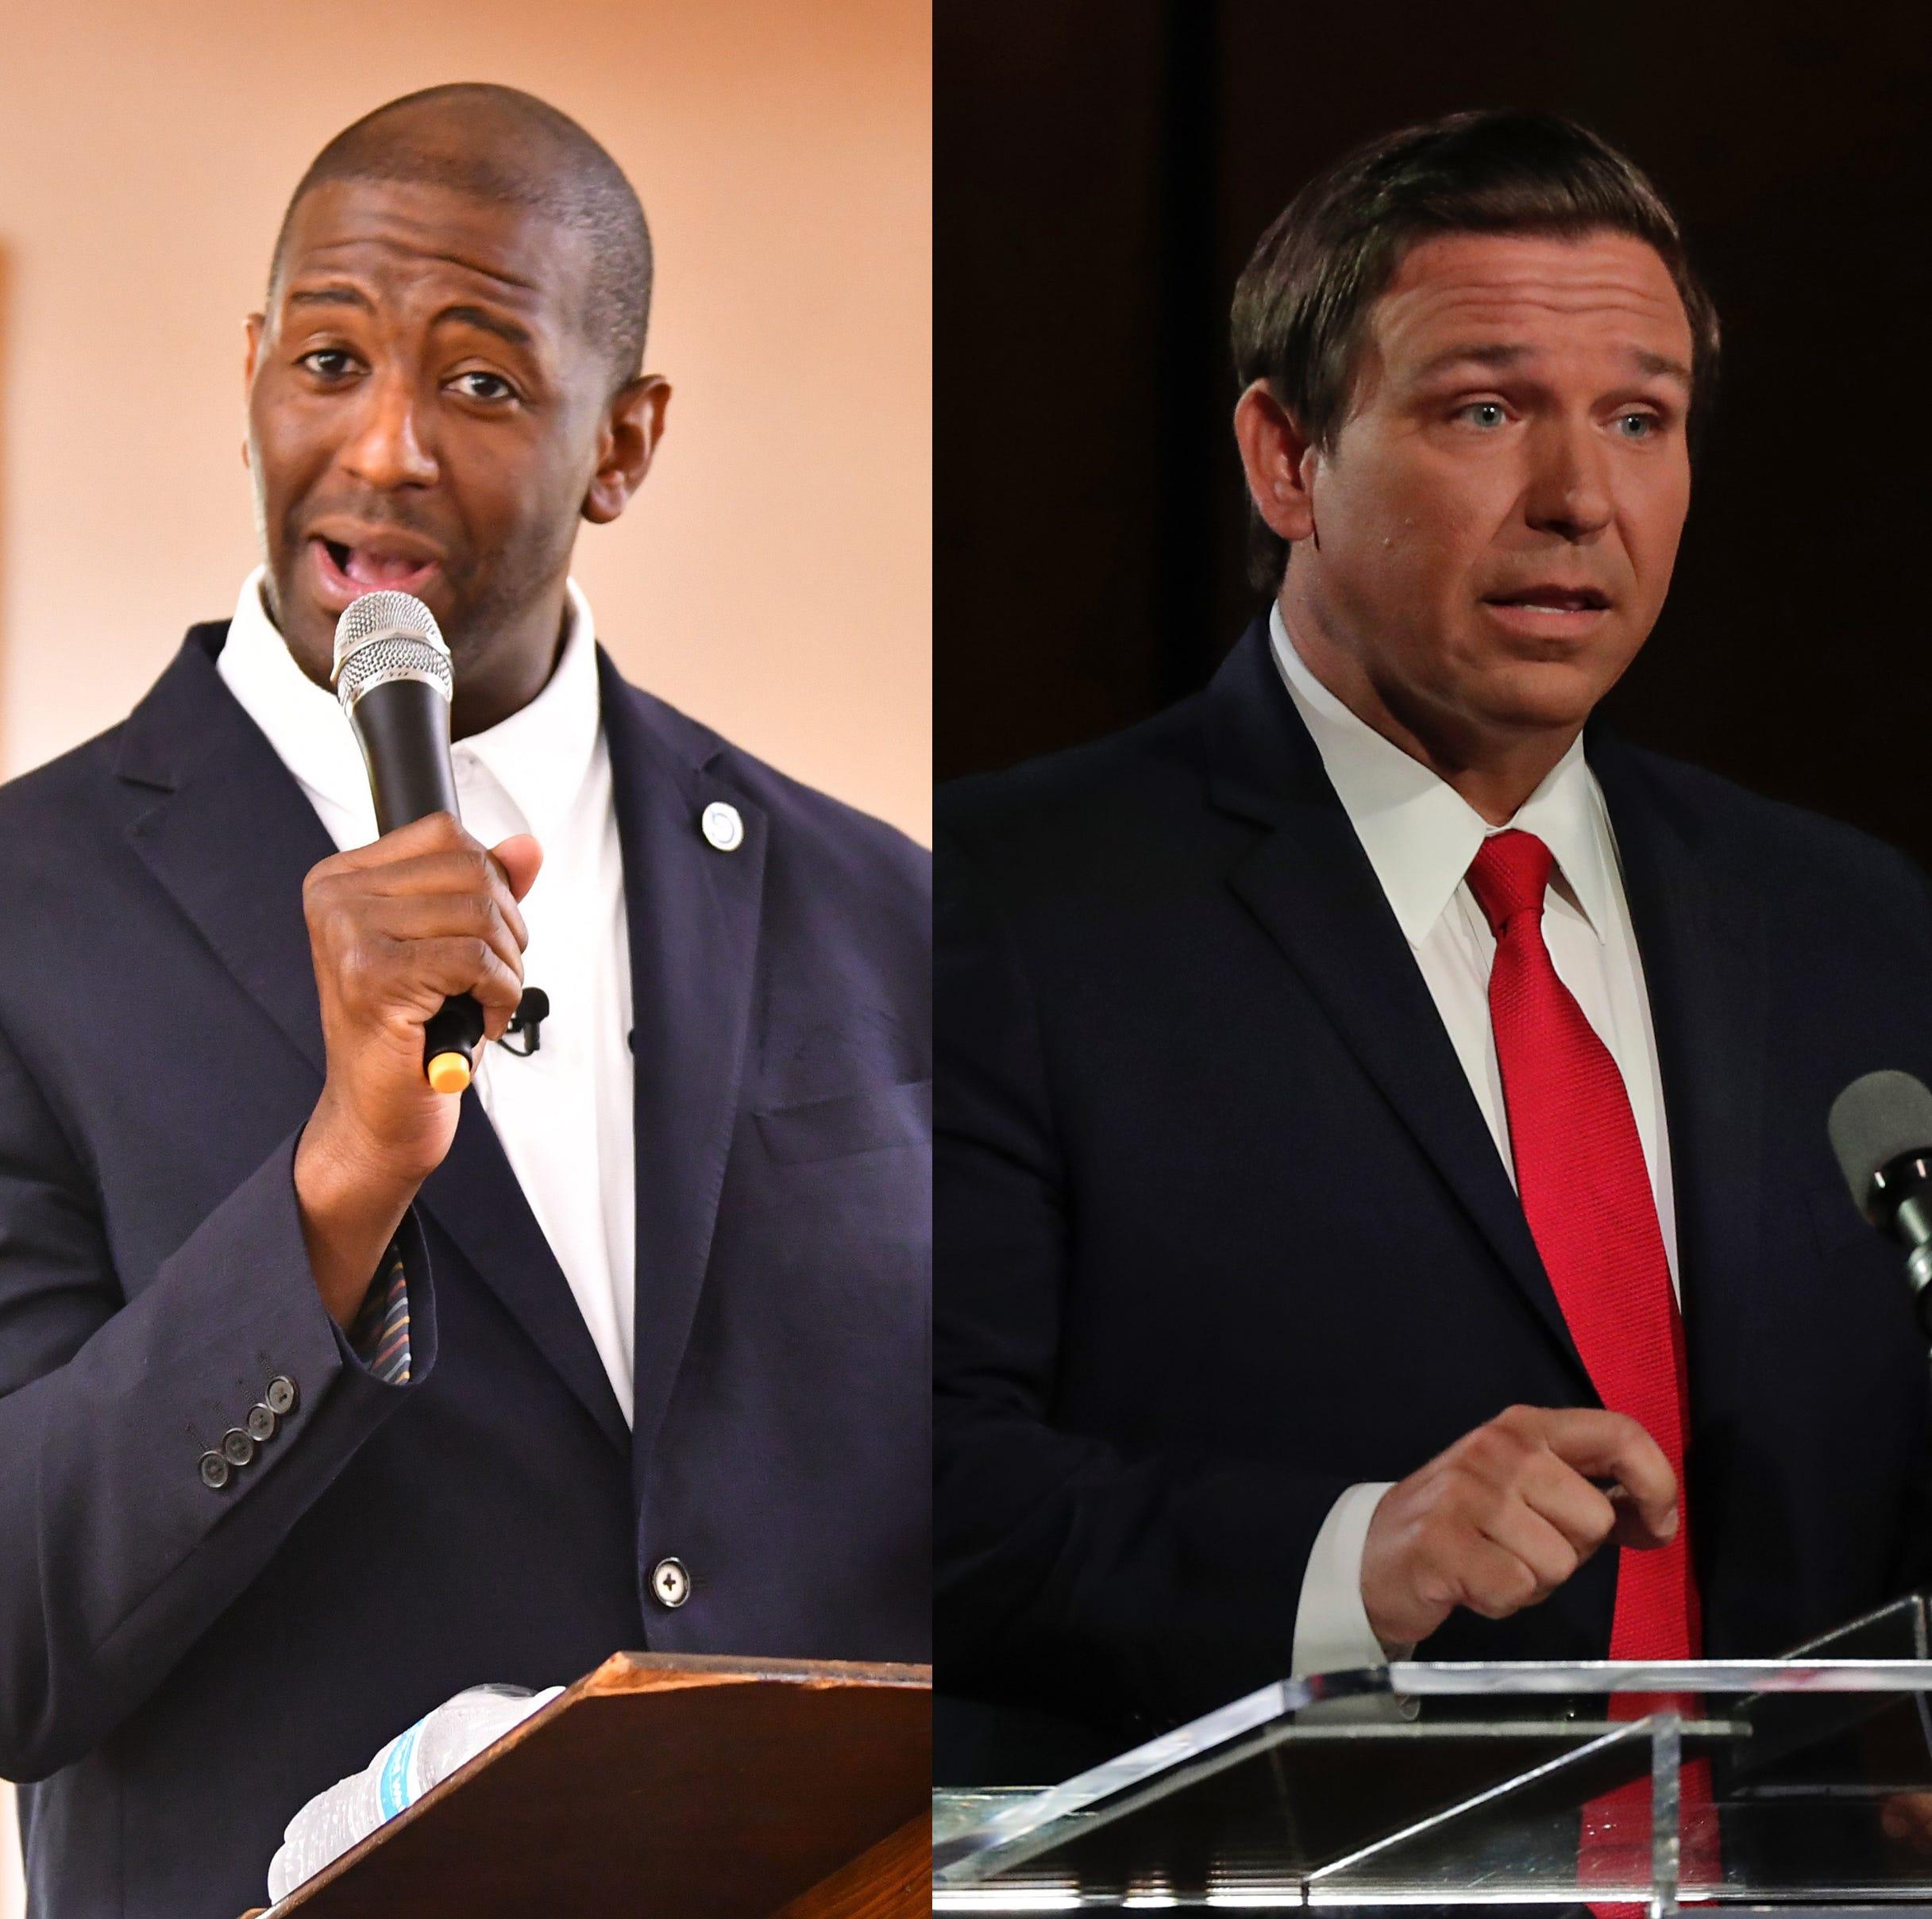 Ron DeSantis and Andrew Gillum clash during Florida governor debate on CNN